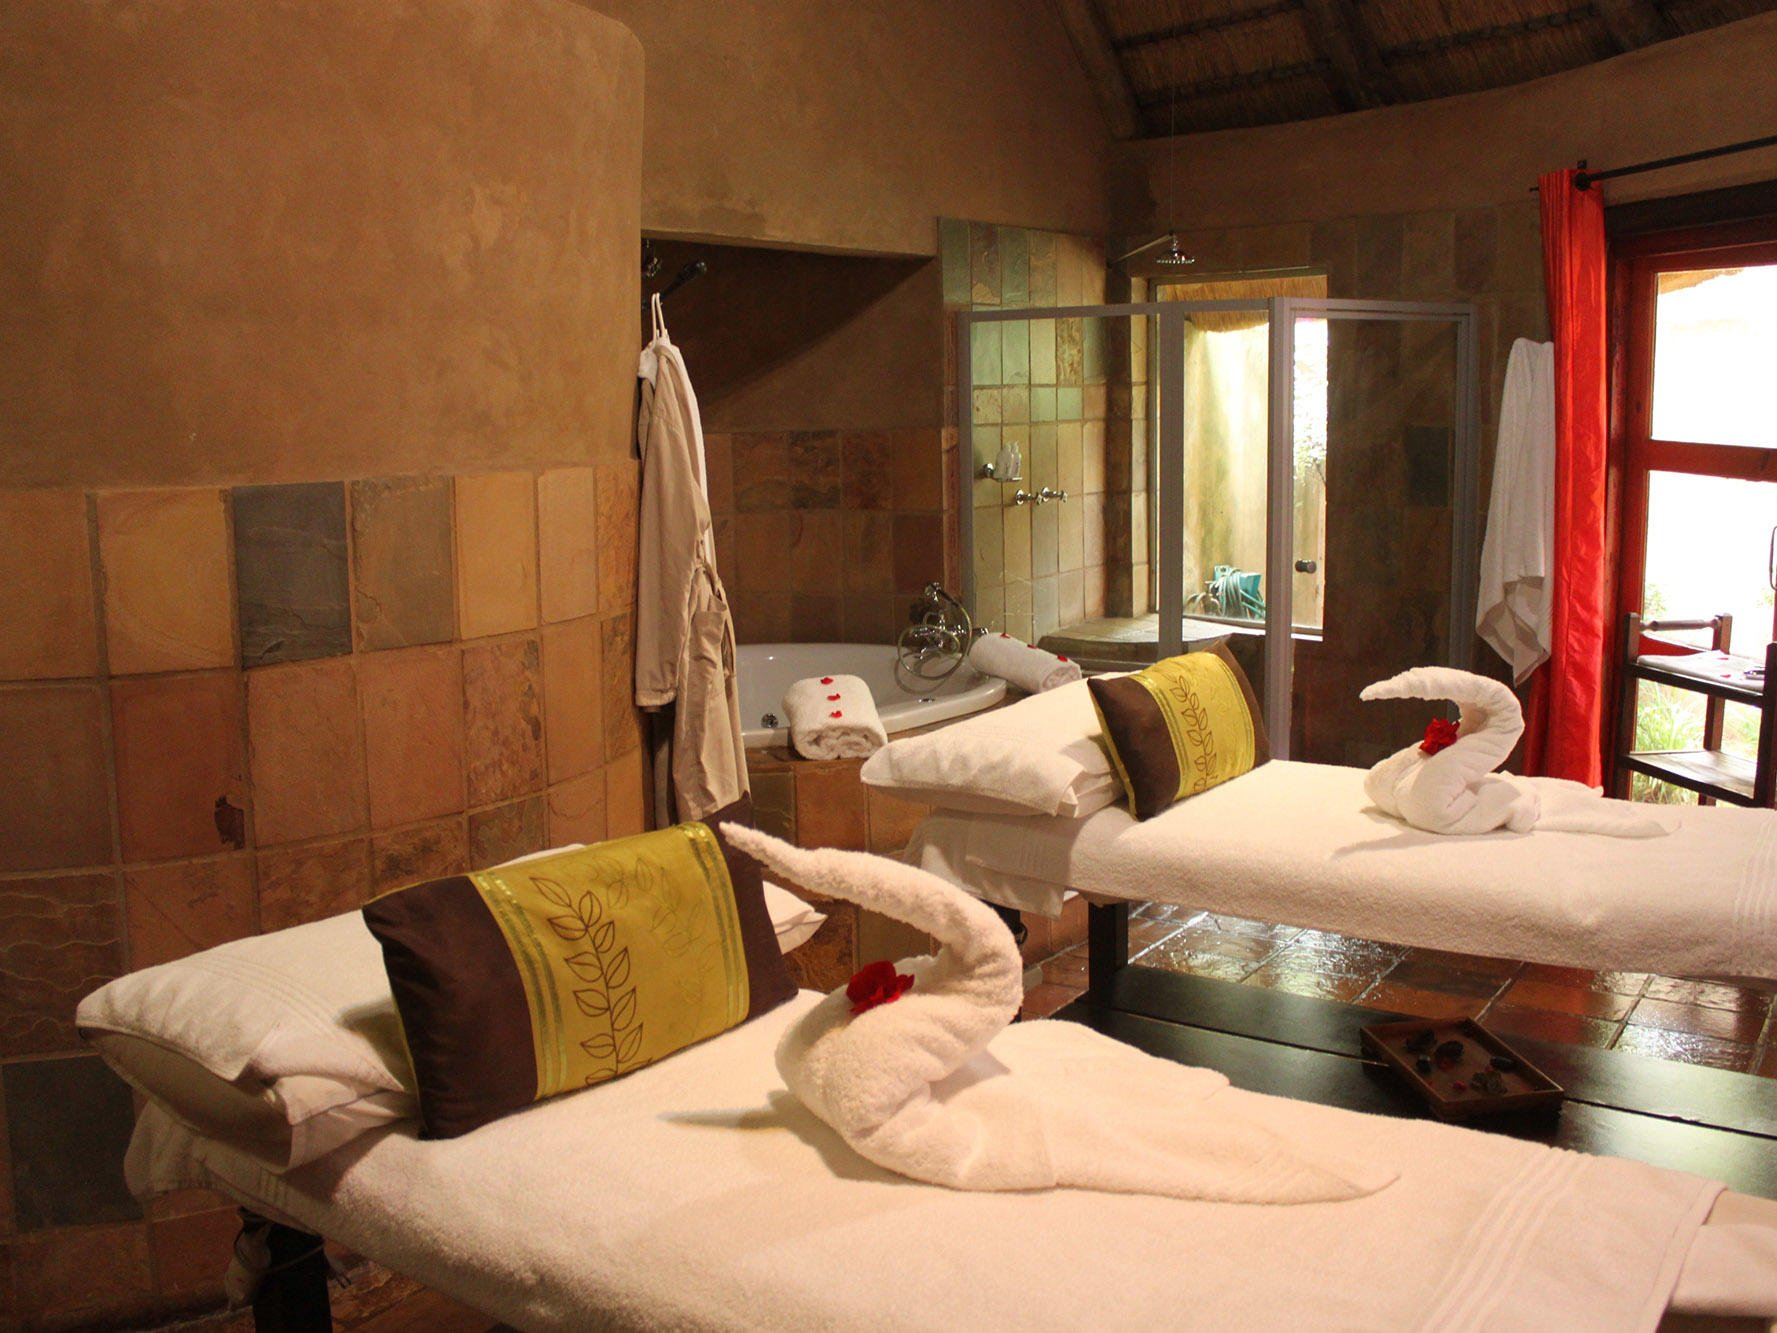 Spa Massage Tables